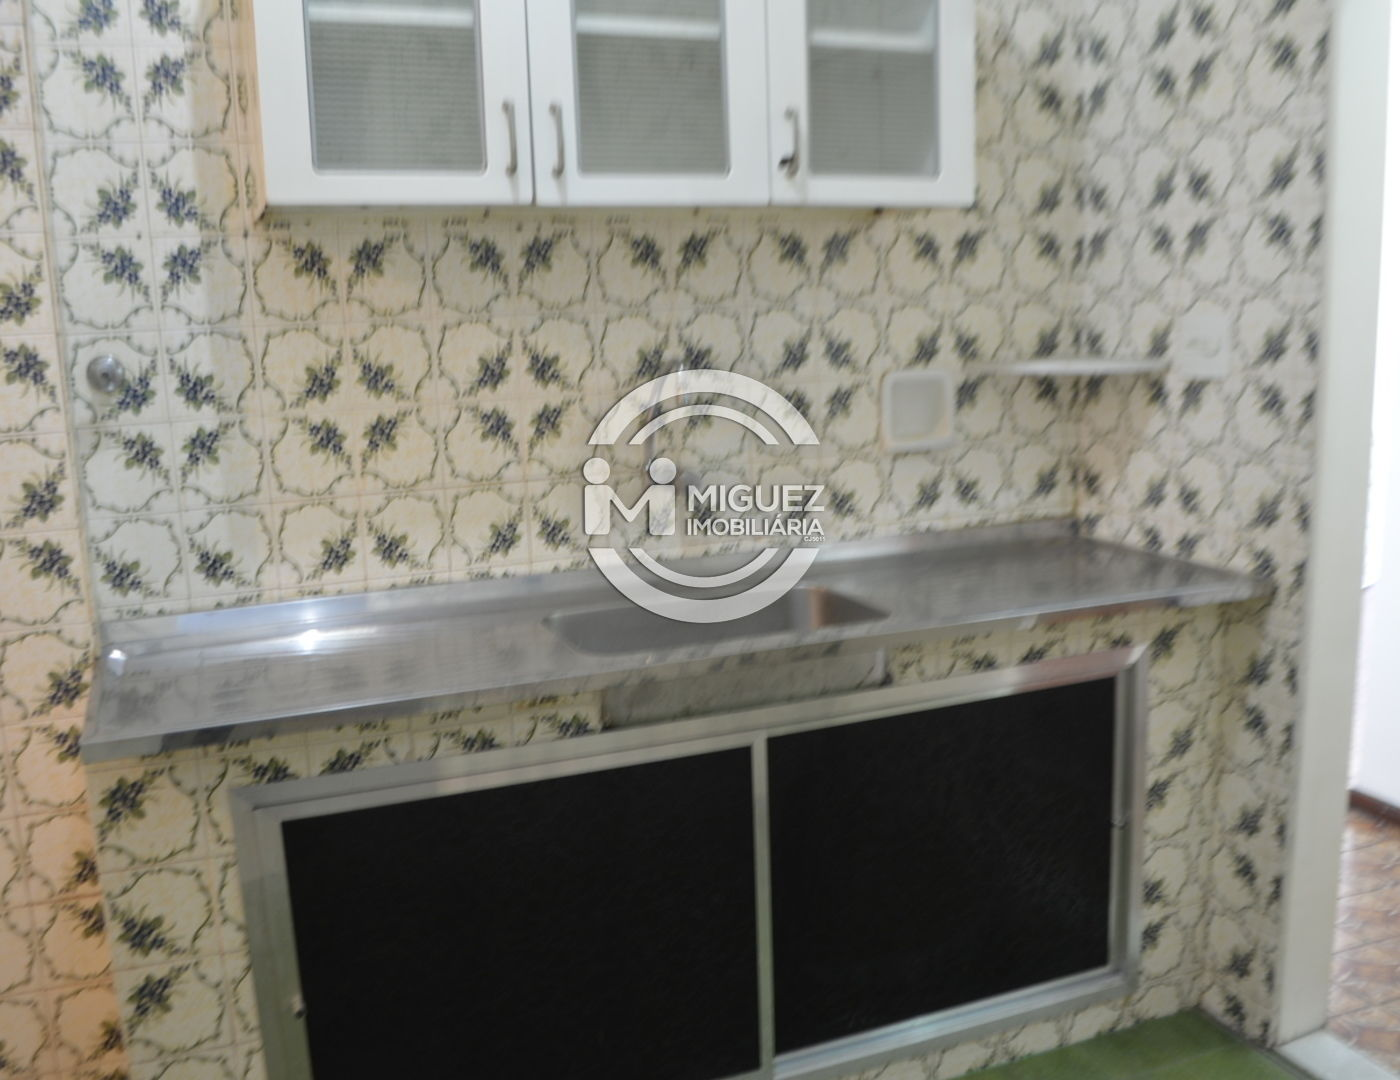 Apartamento, aluguel, Rua Maestro Vila Lobos - Tijuca , Rio de janeiro